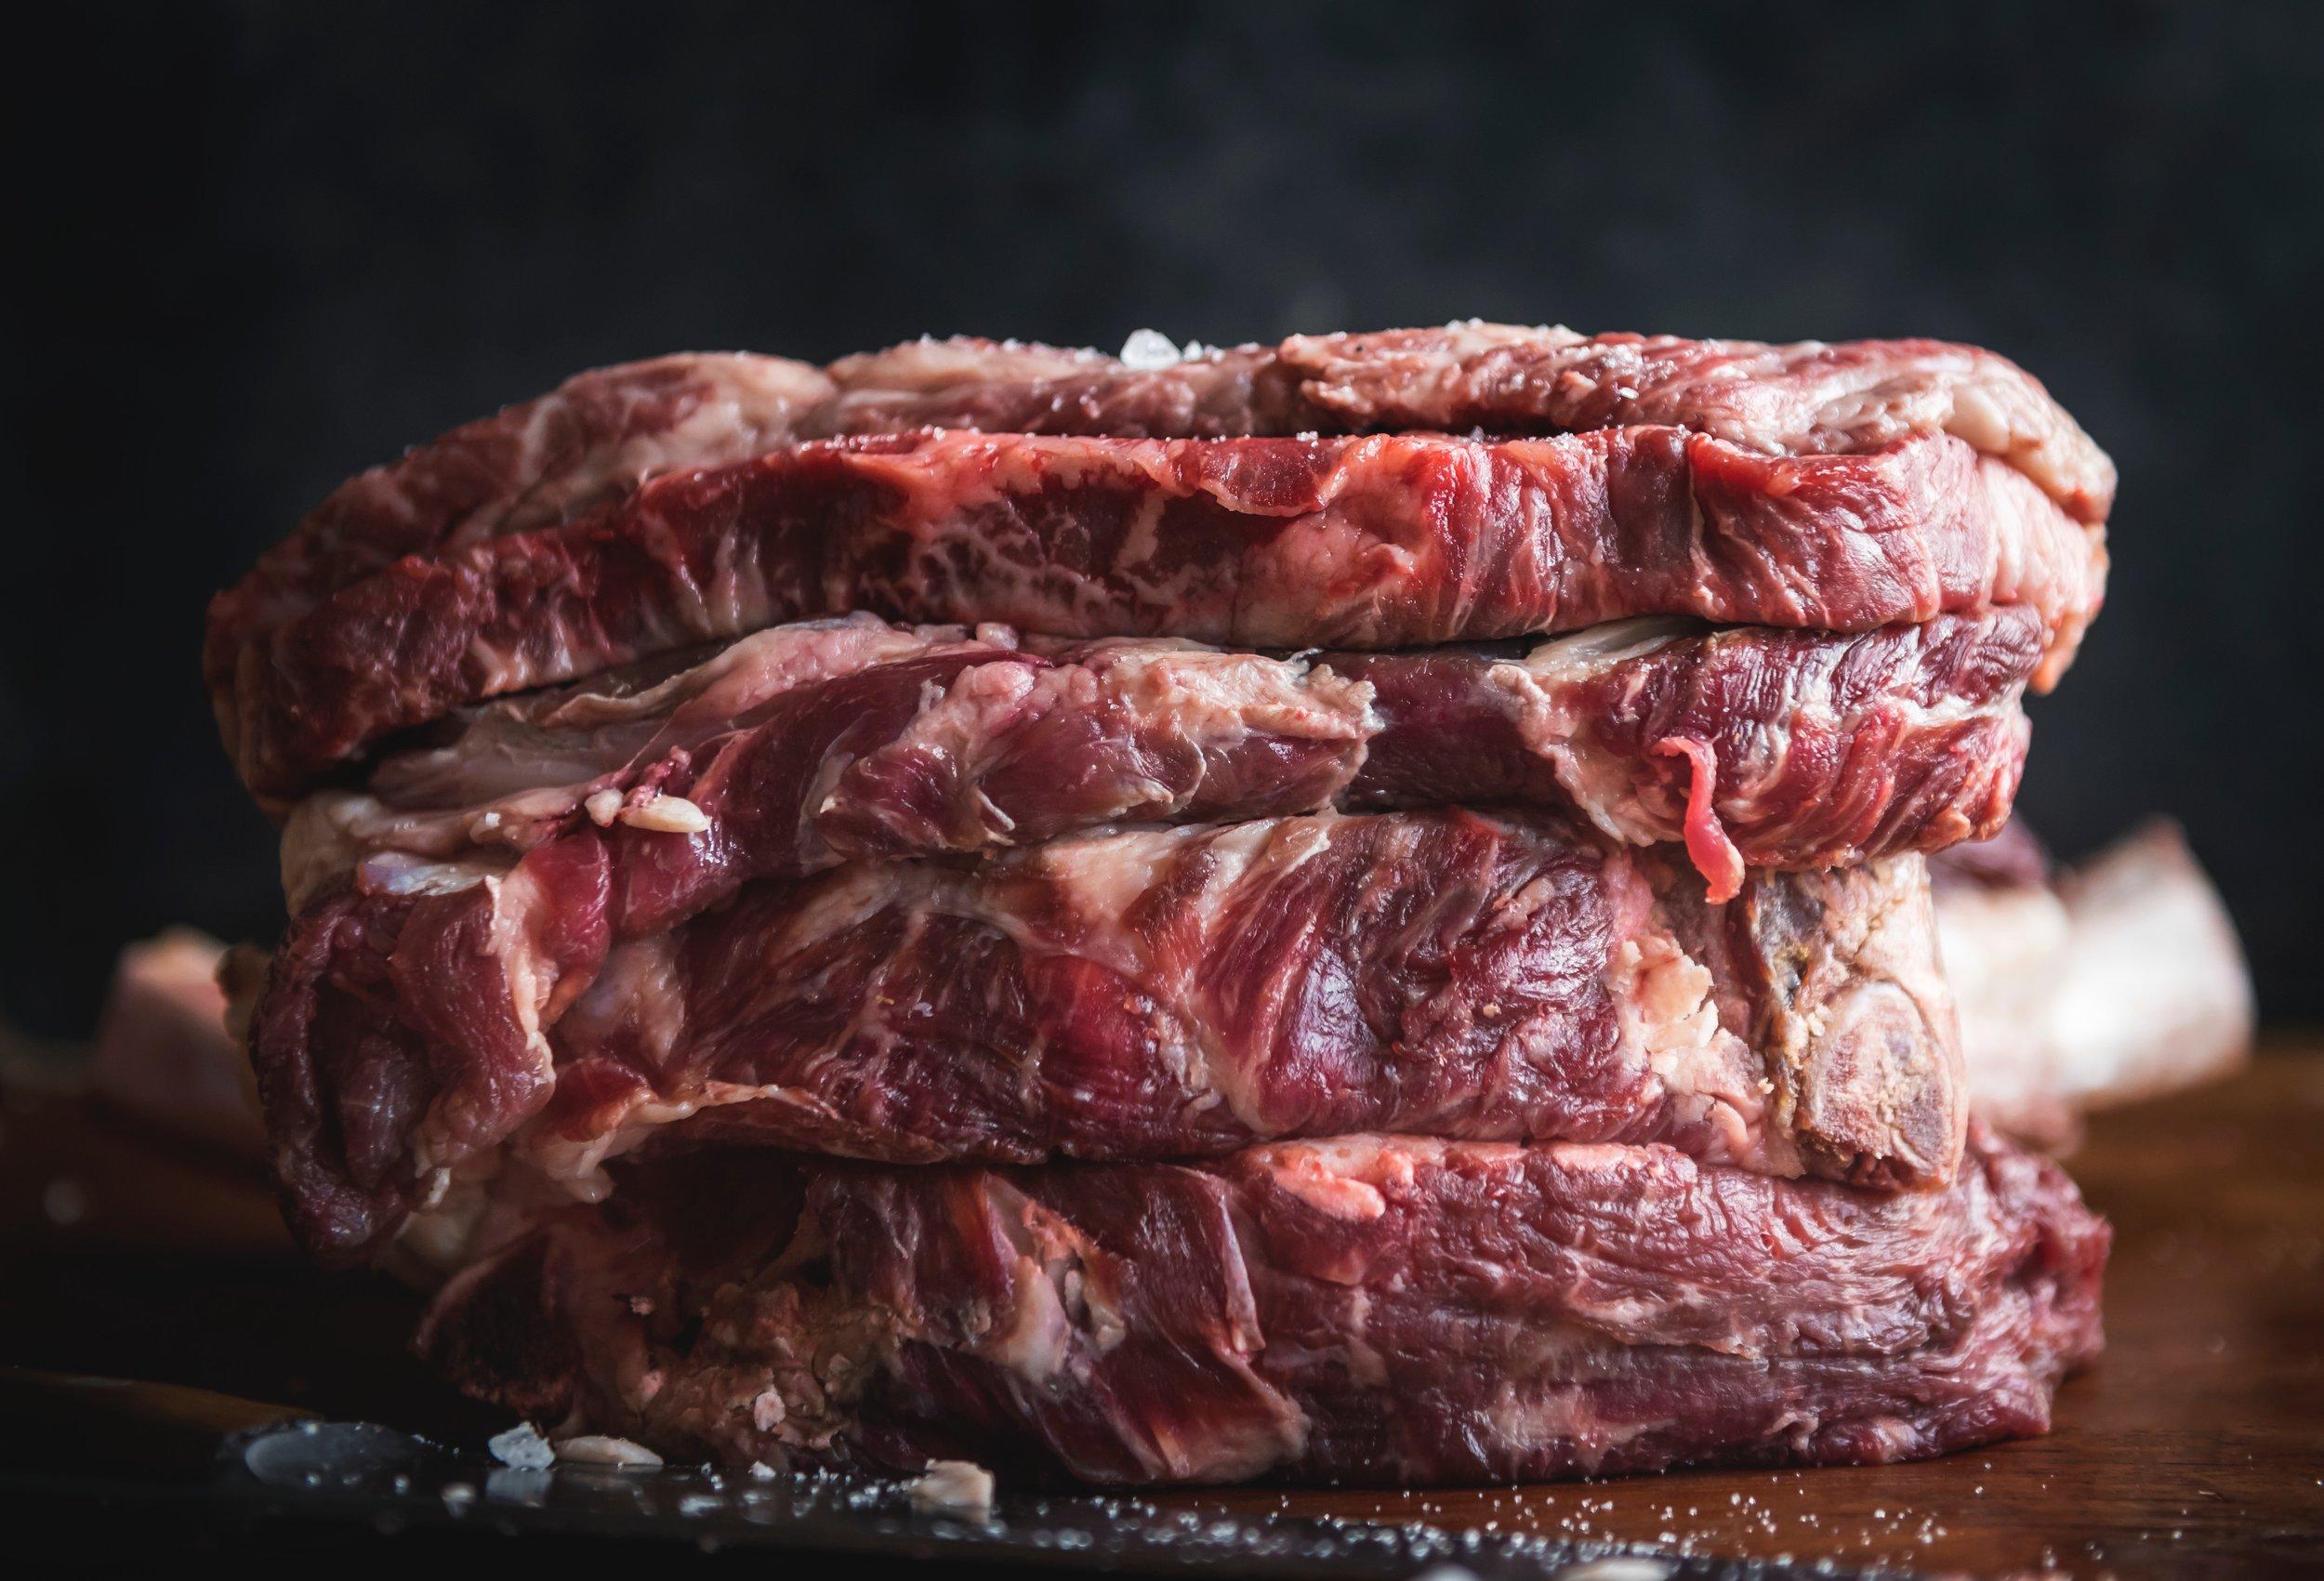 beef-beef-chuck-beef-steak-1539684_FREE_rawpixels.jpg